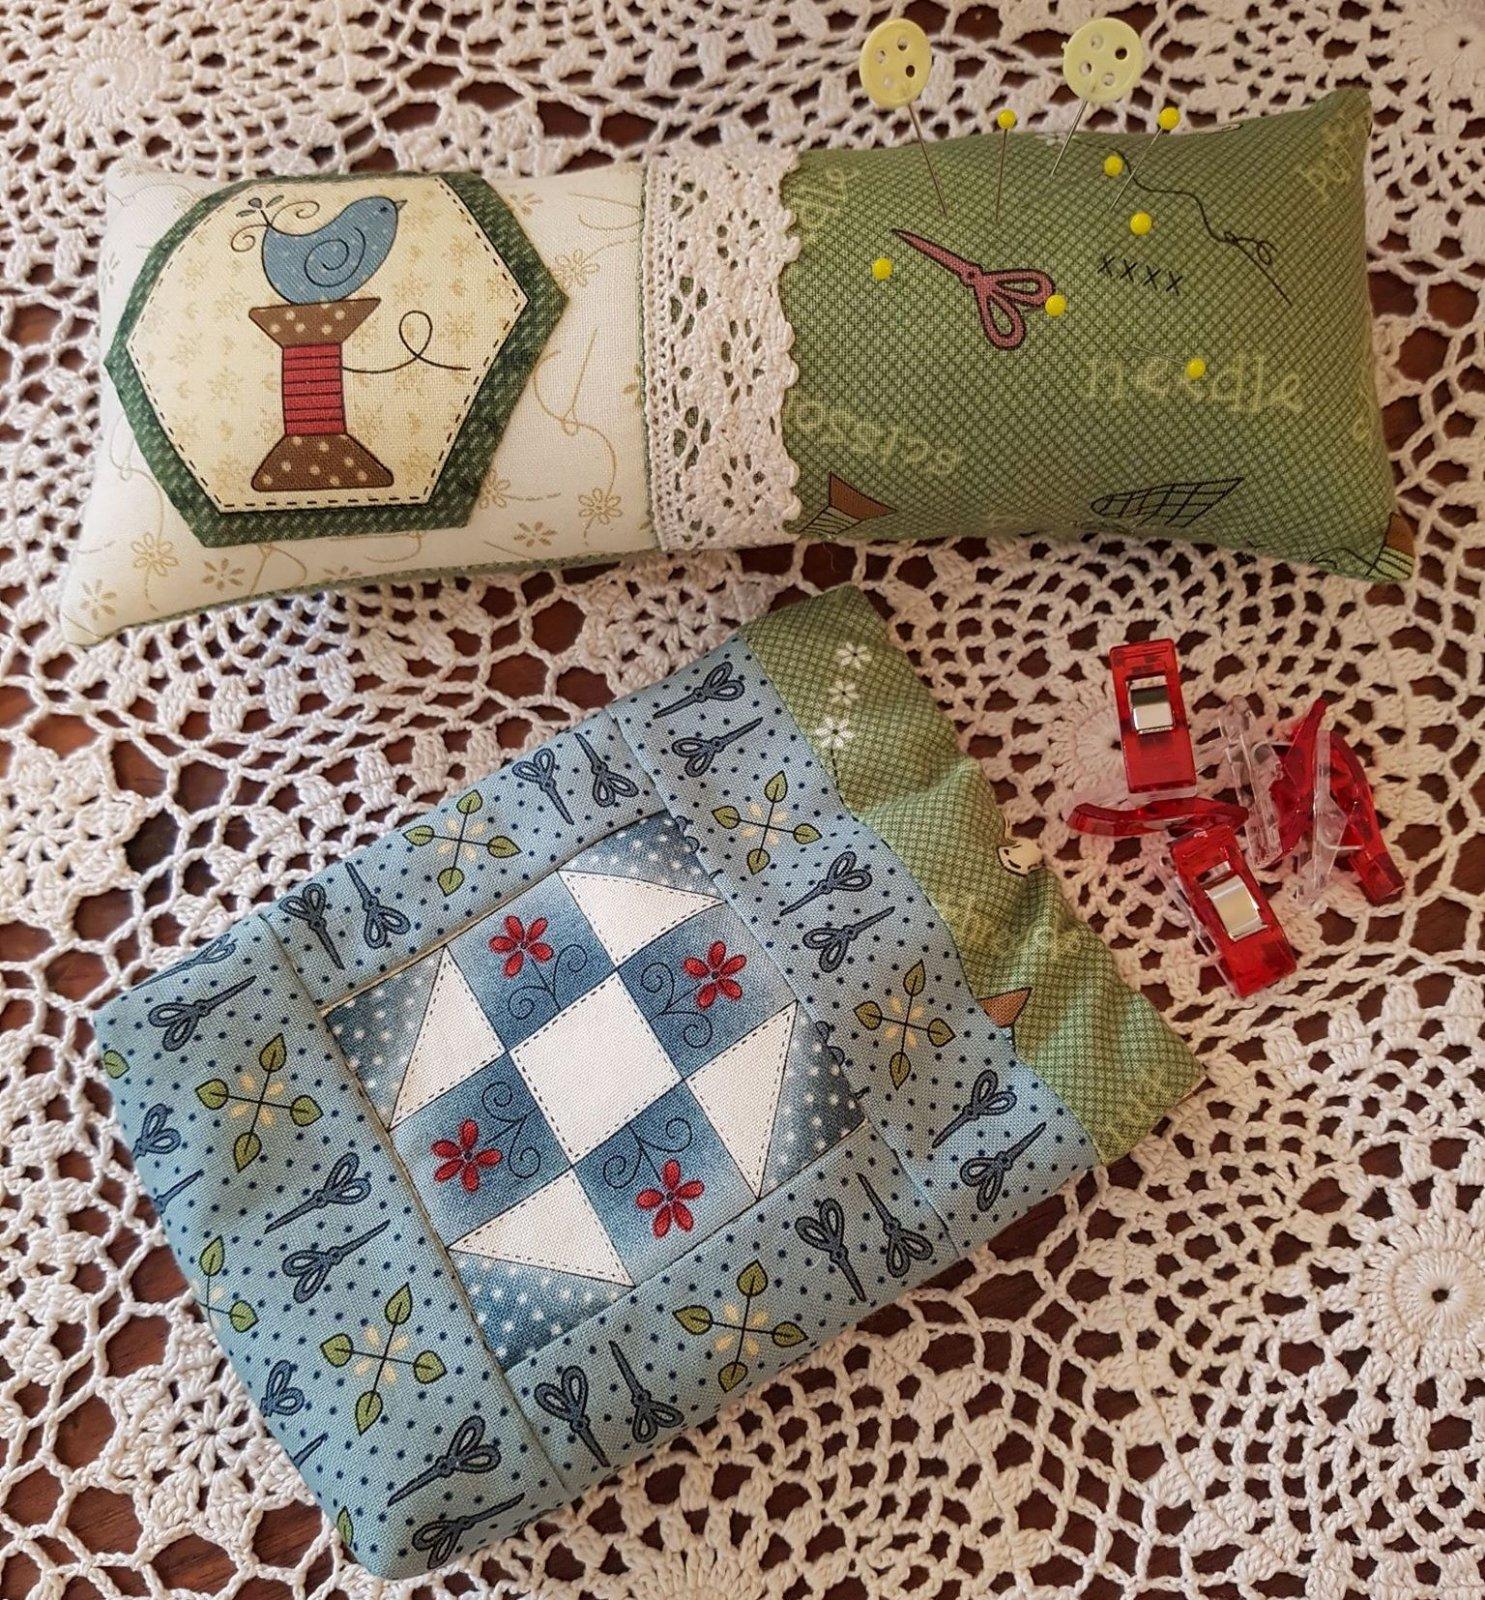 Home Sewn Sewing Set Kit